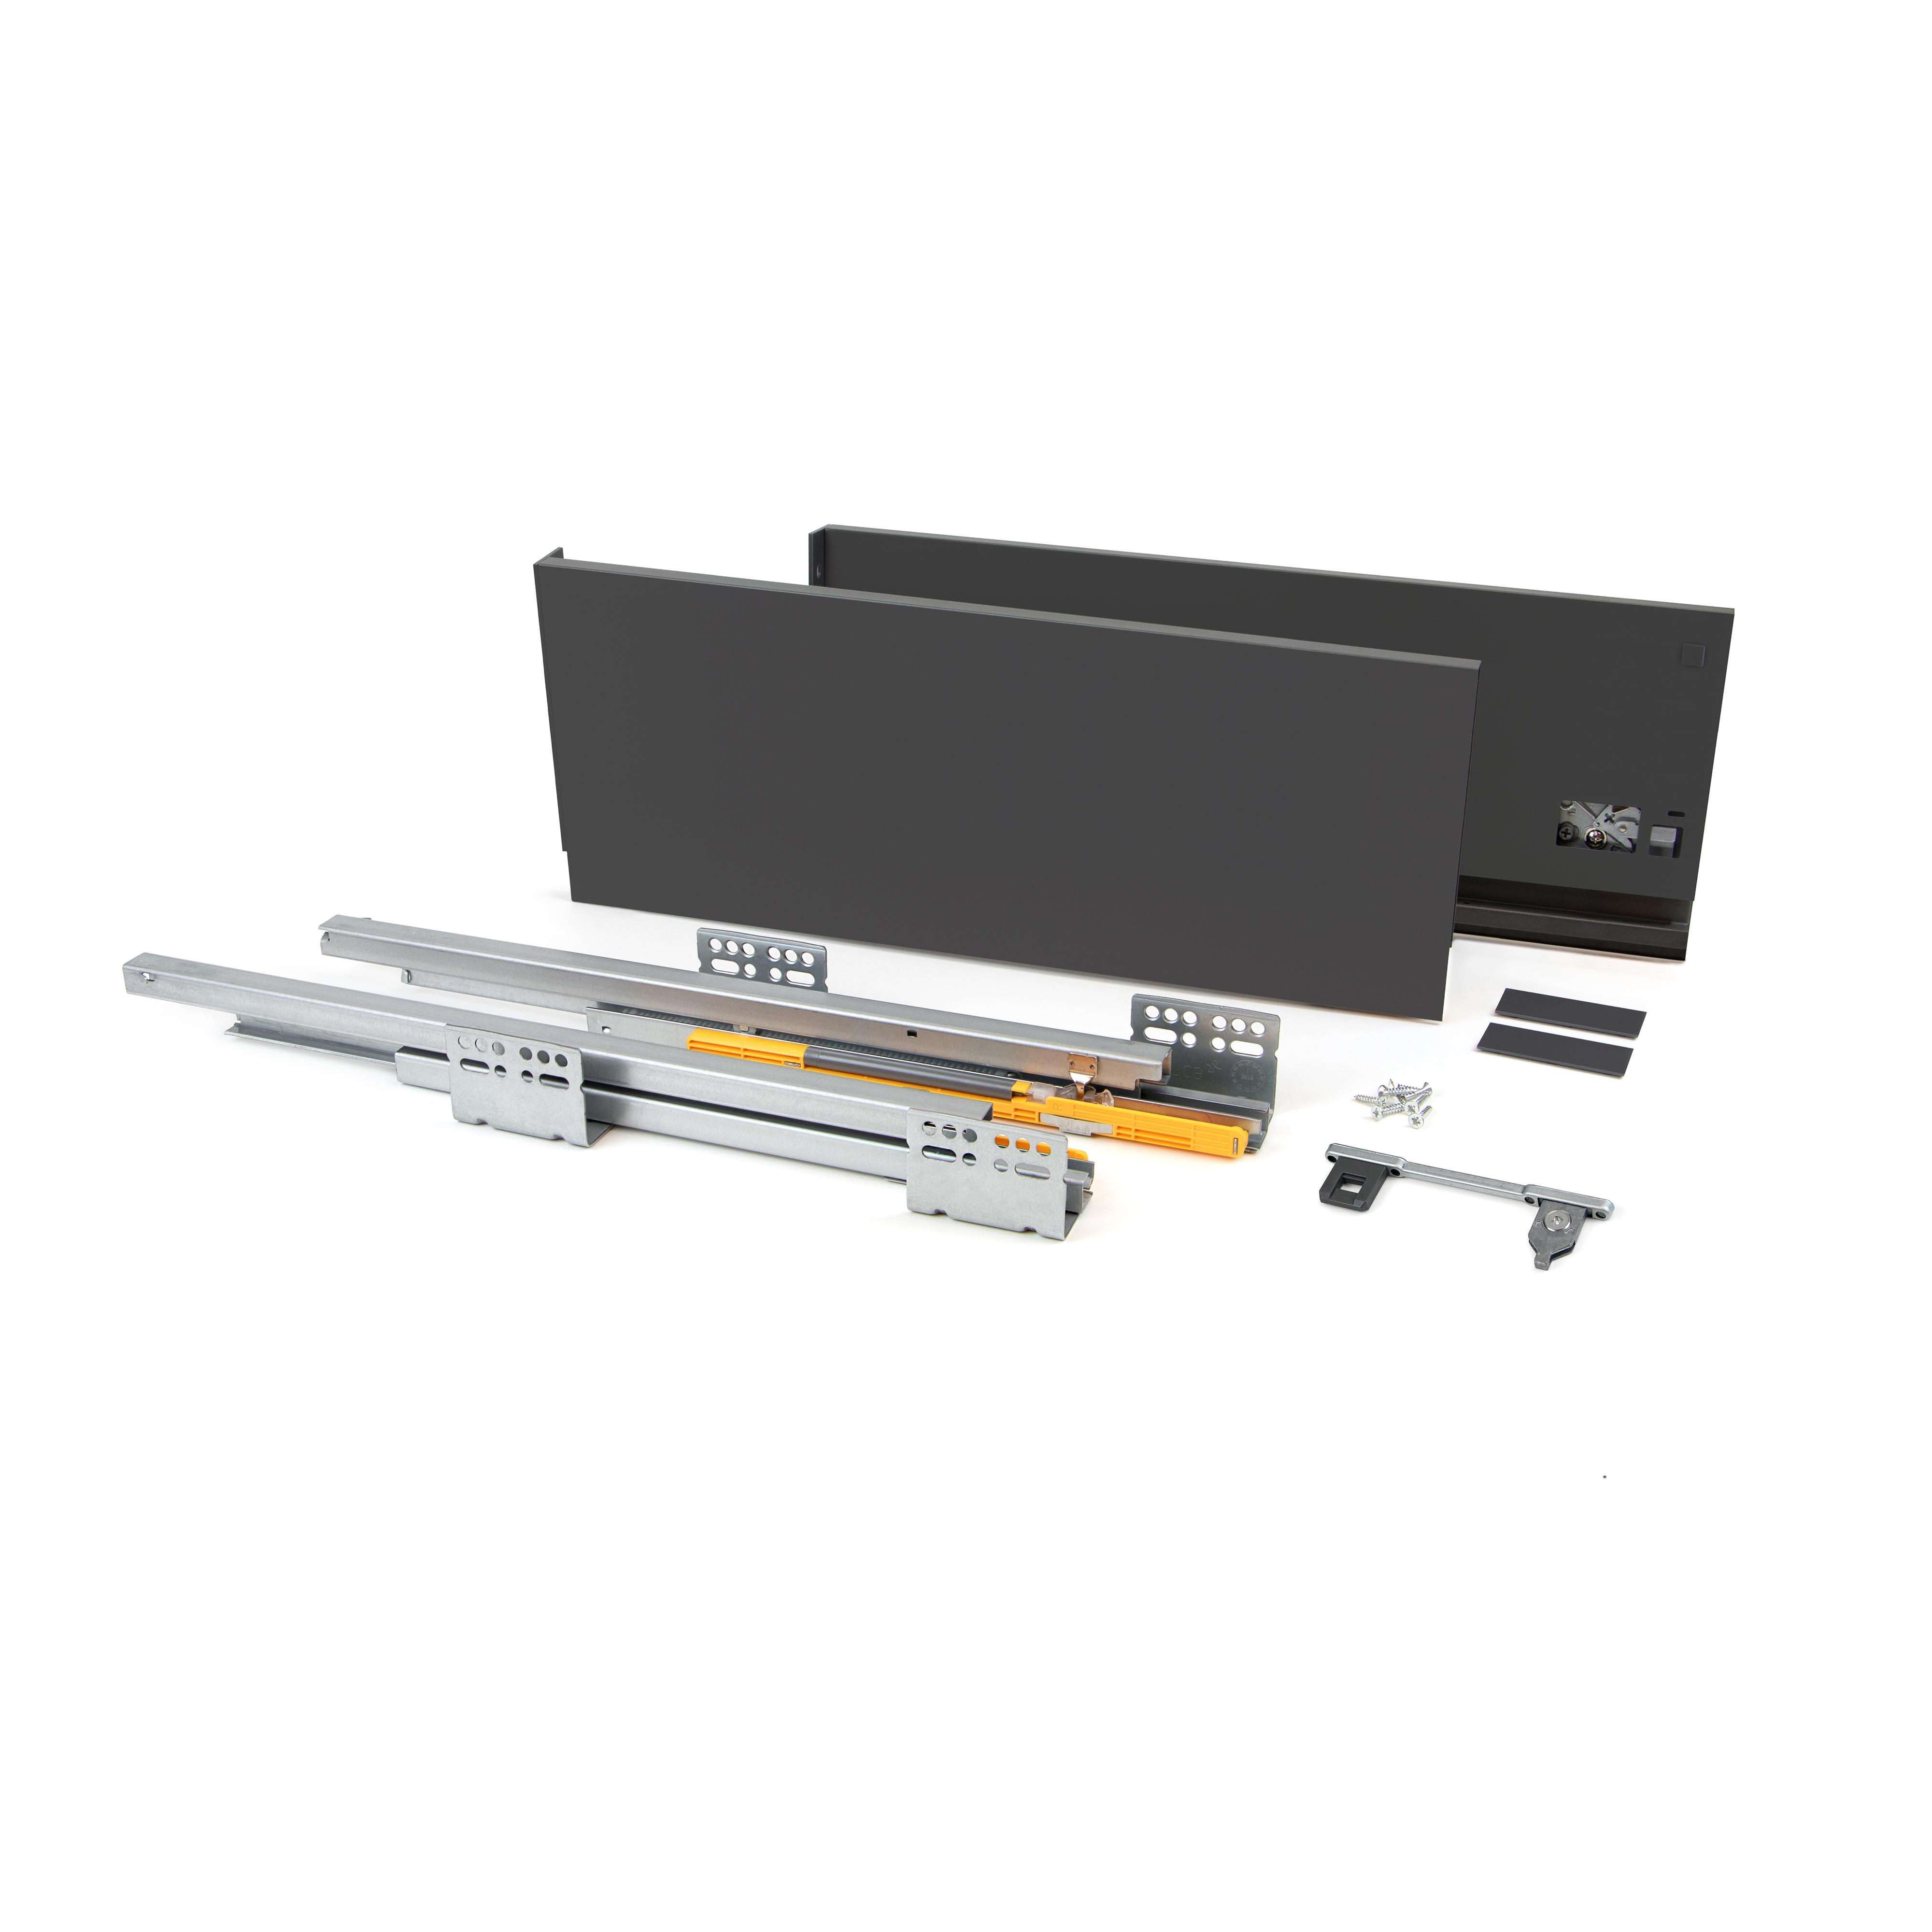 Emuca Kit cassetto per cucina Concept, altezza 185 mm, prof. 400 mm, chiusura soft, Acciaio, Grigio antracite